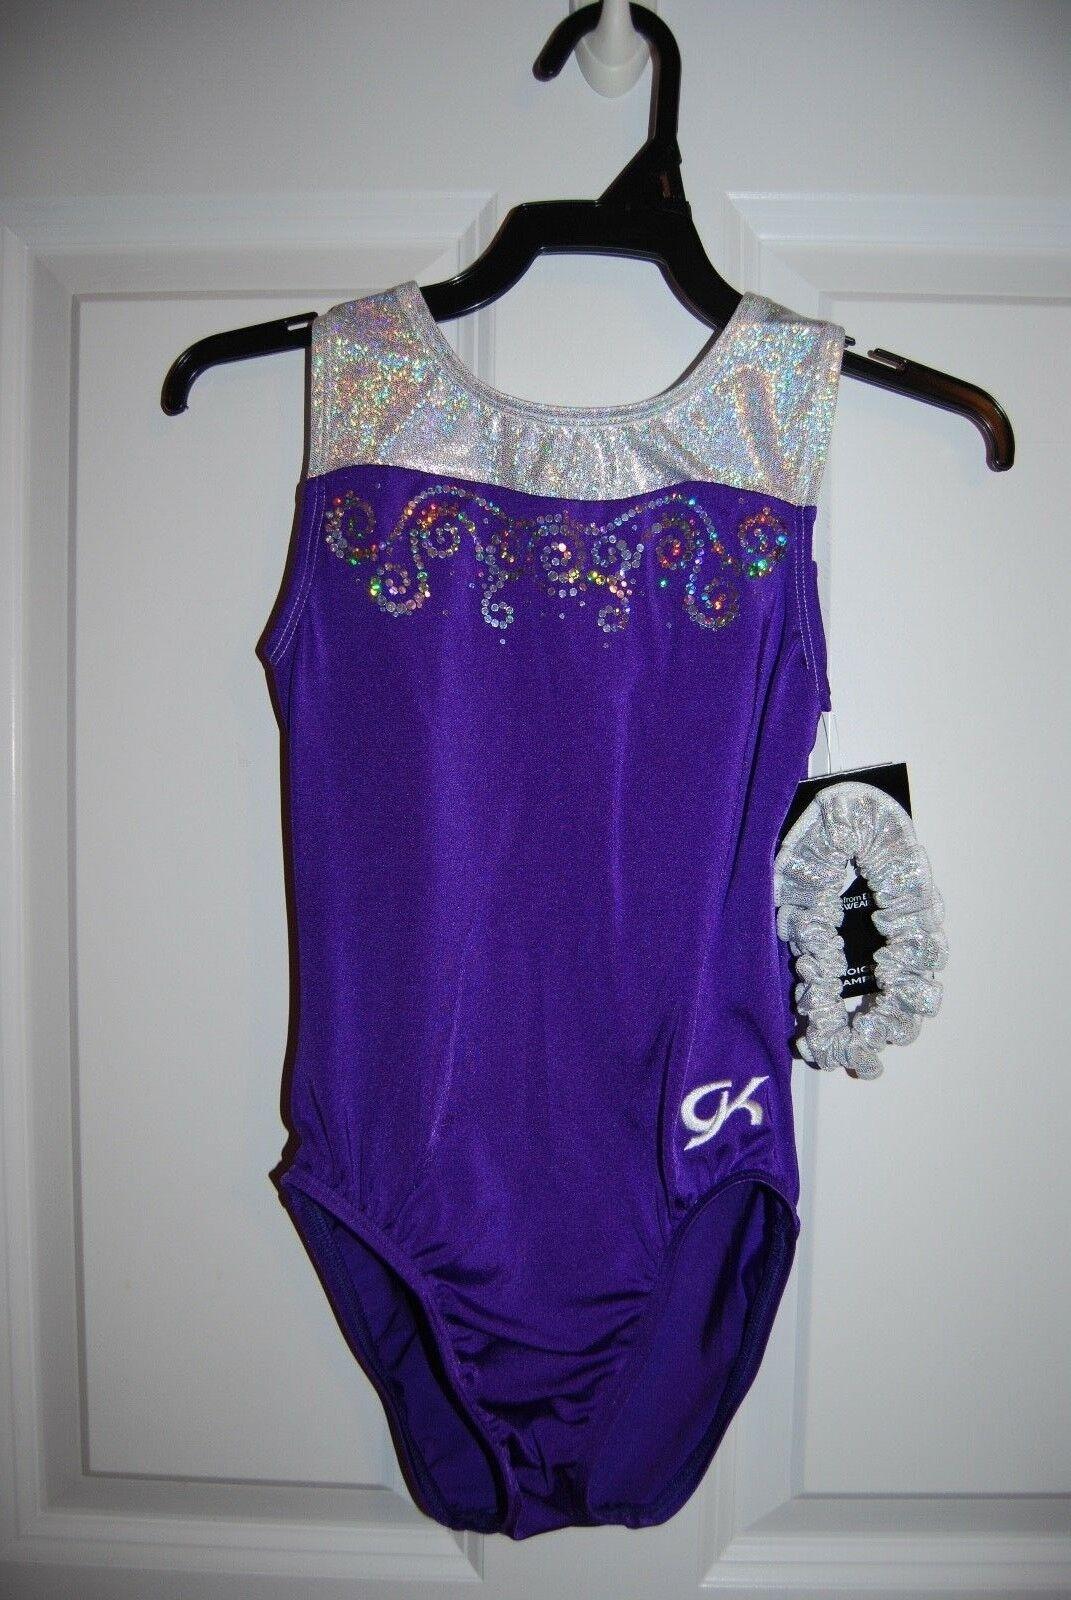 GK Elite Gymnastics Leotard - Adult X-Small - White Sparkle Hologram Purple